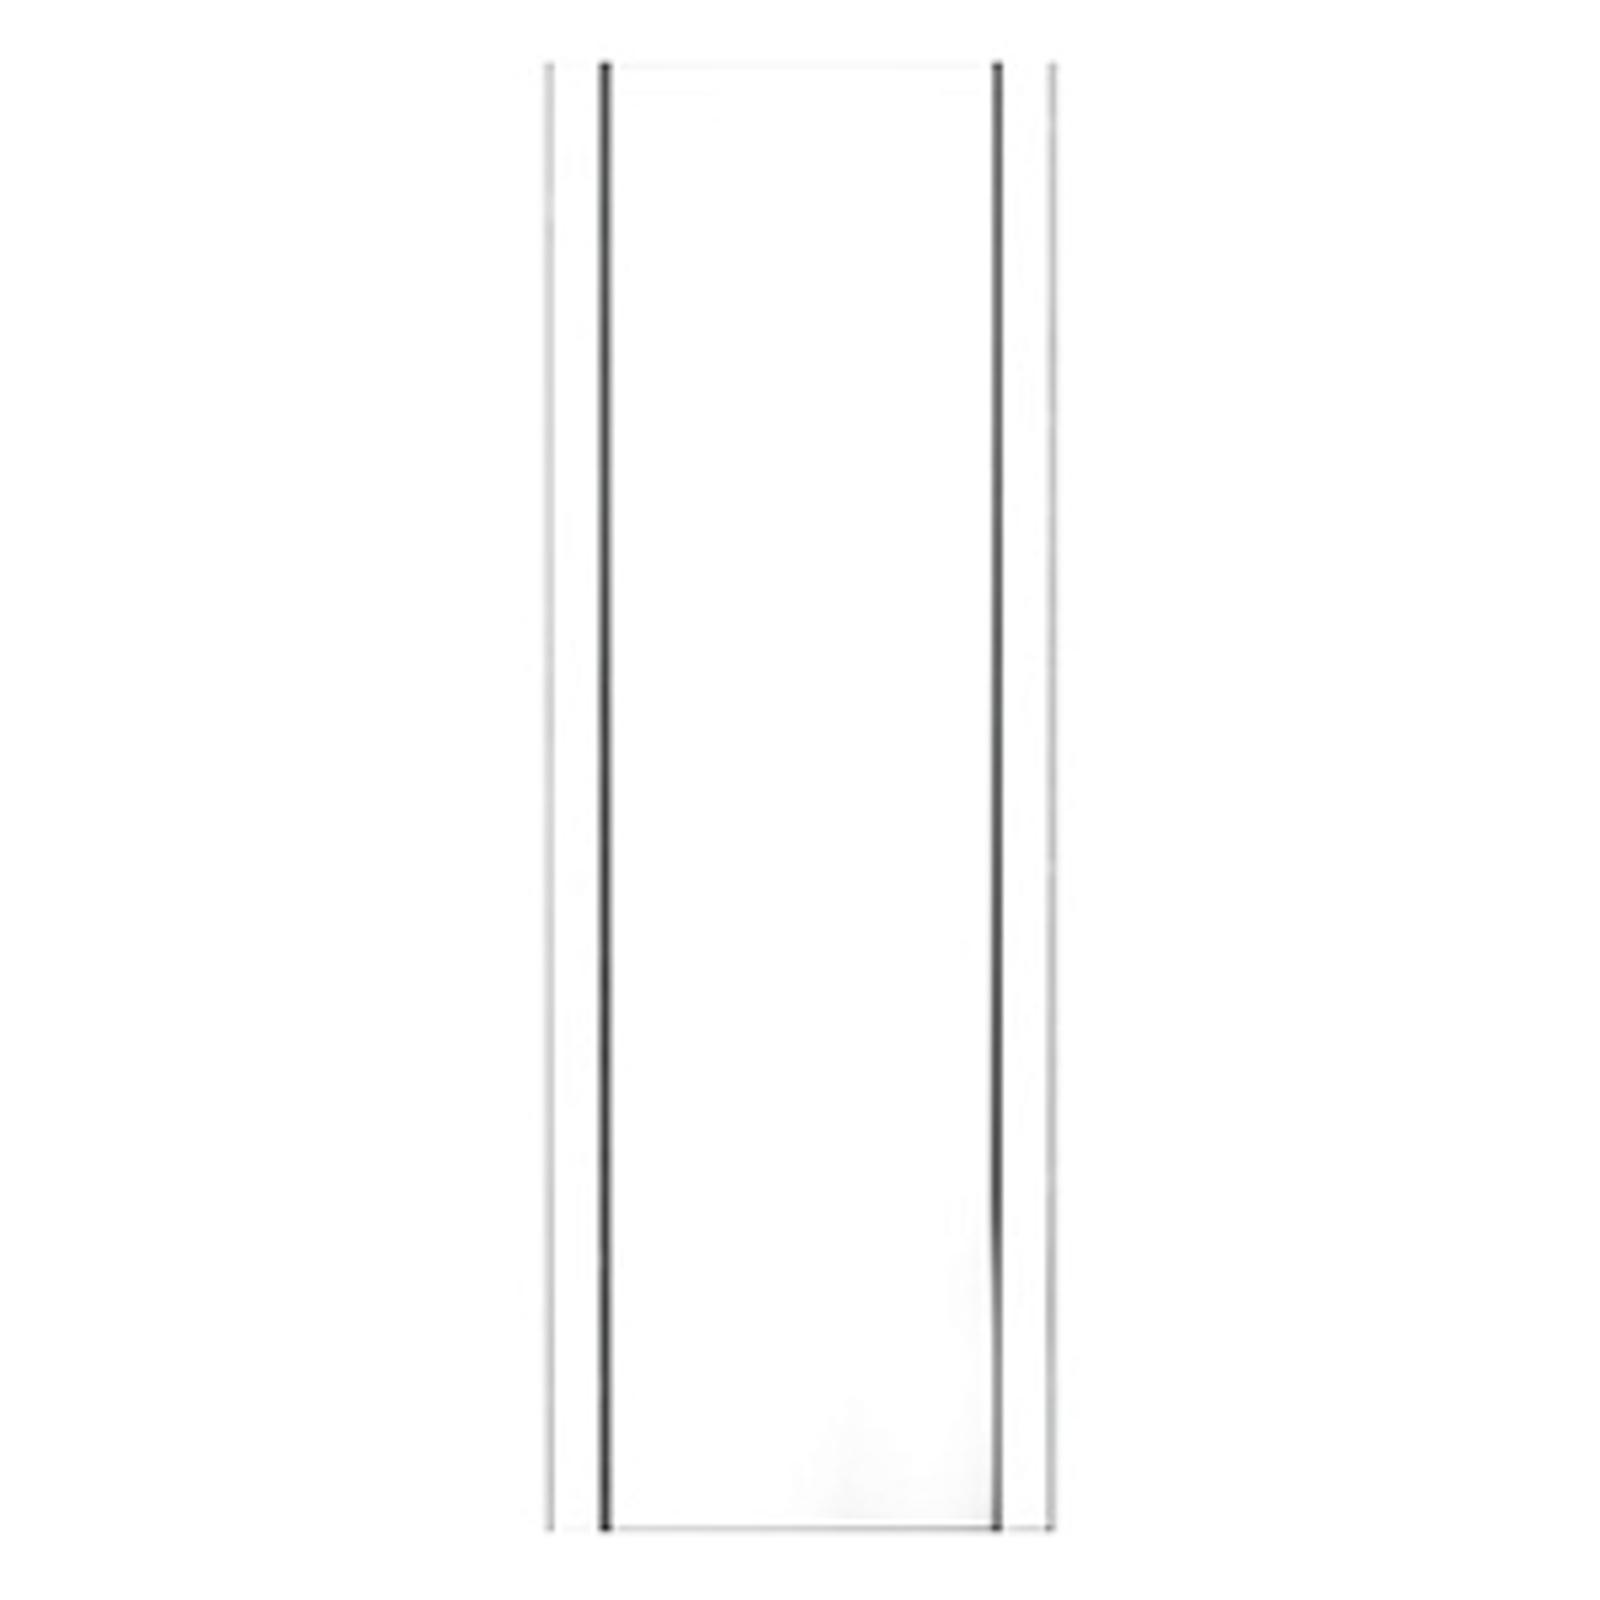 Velformet postkassestativ Stand 1001, hvit